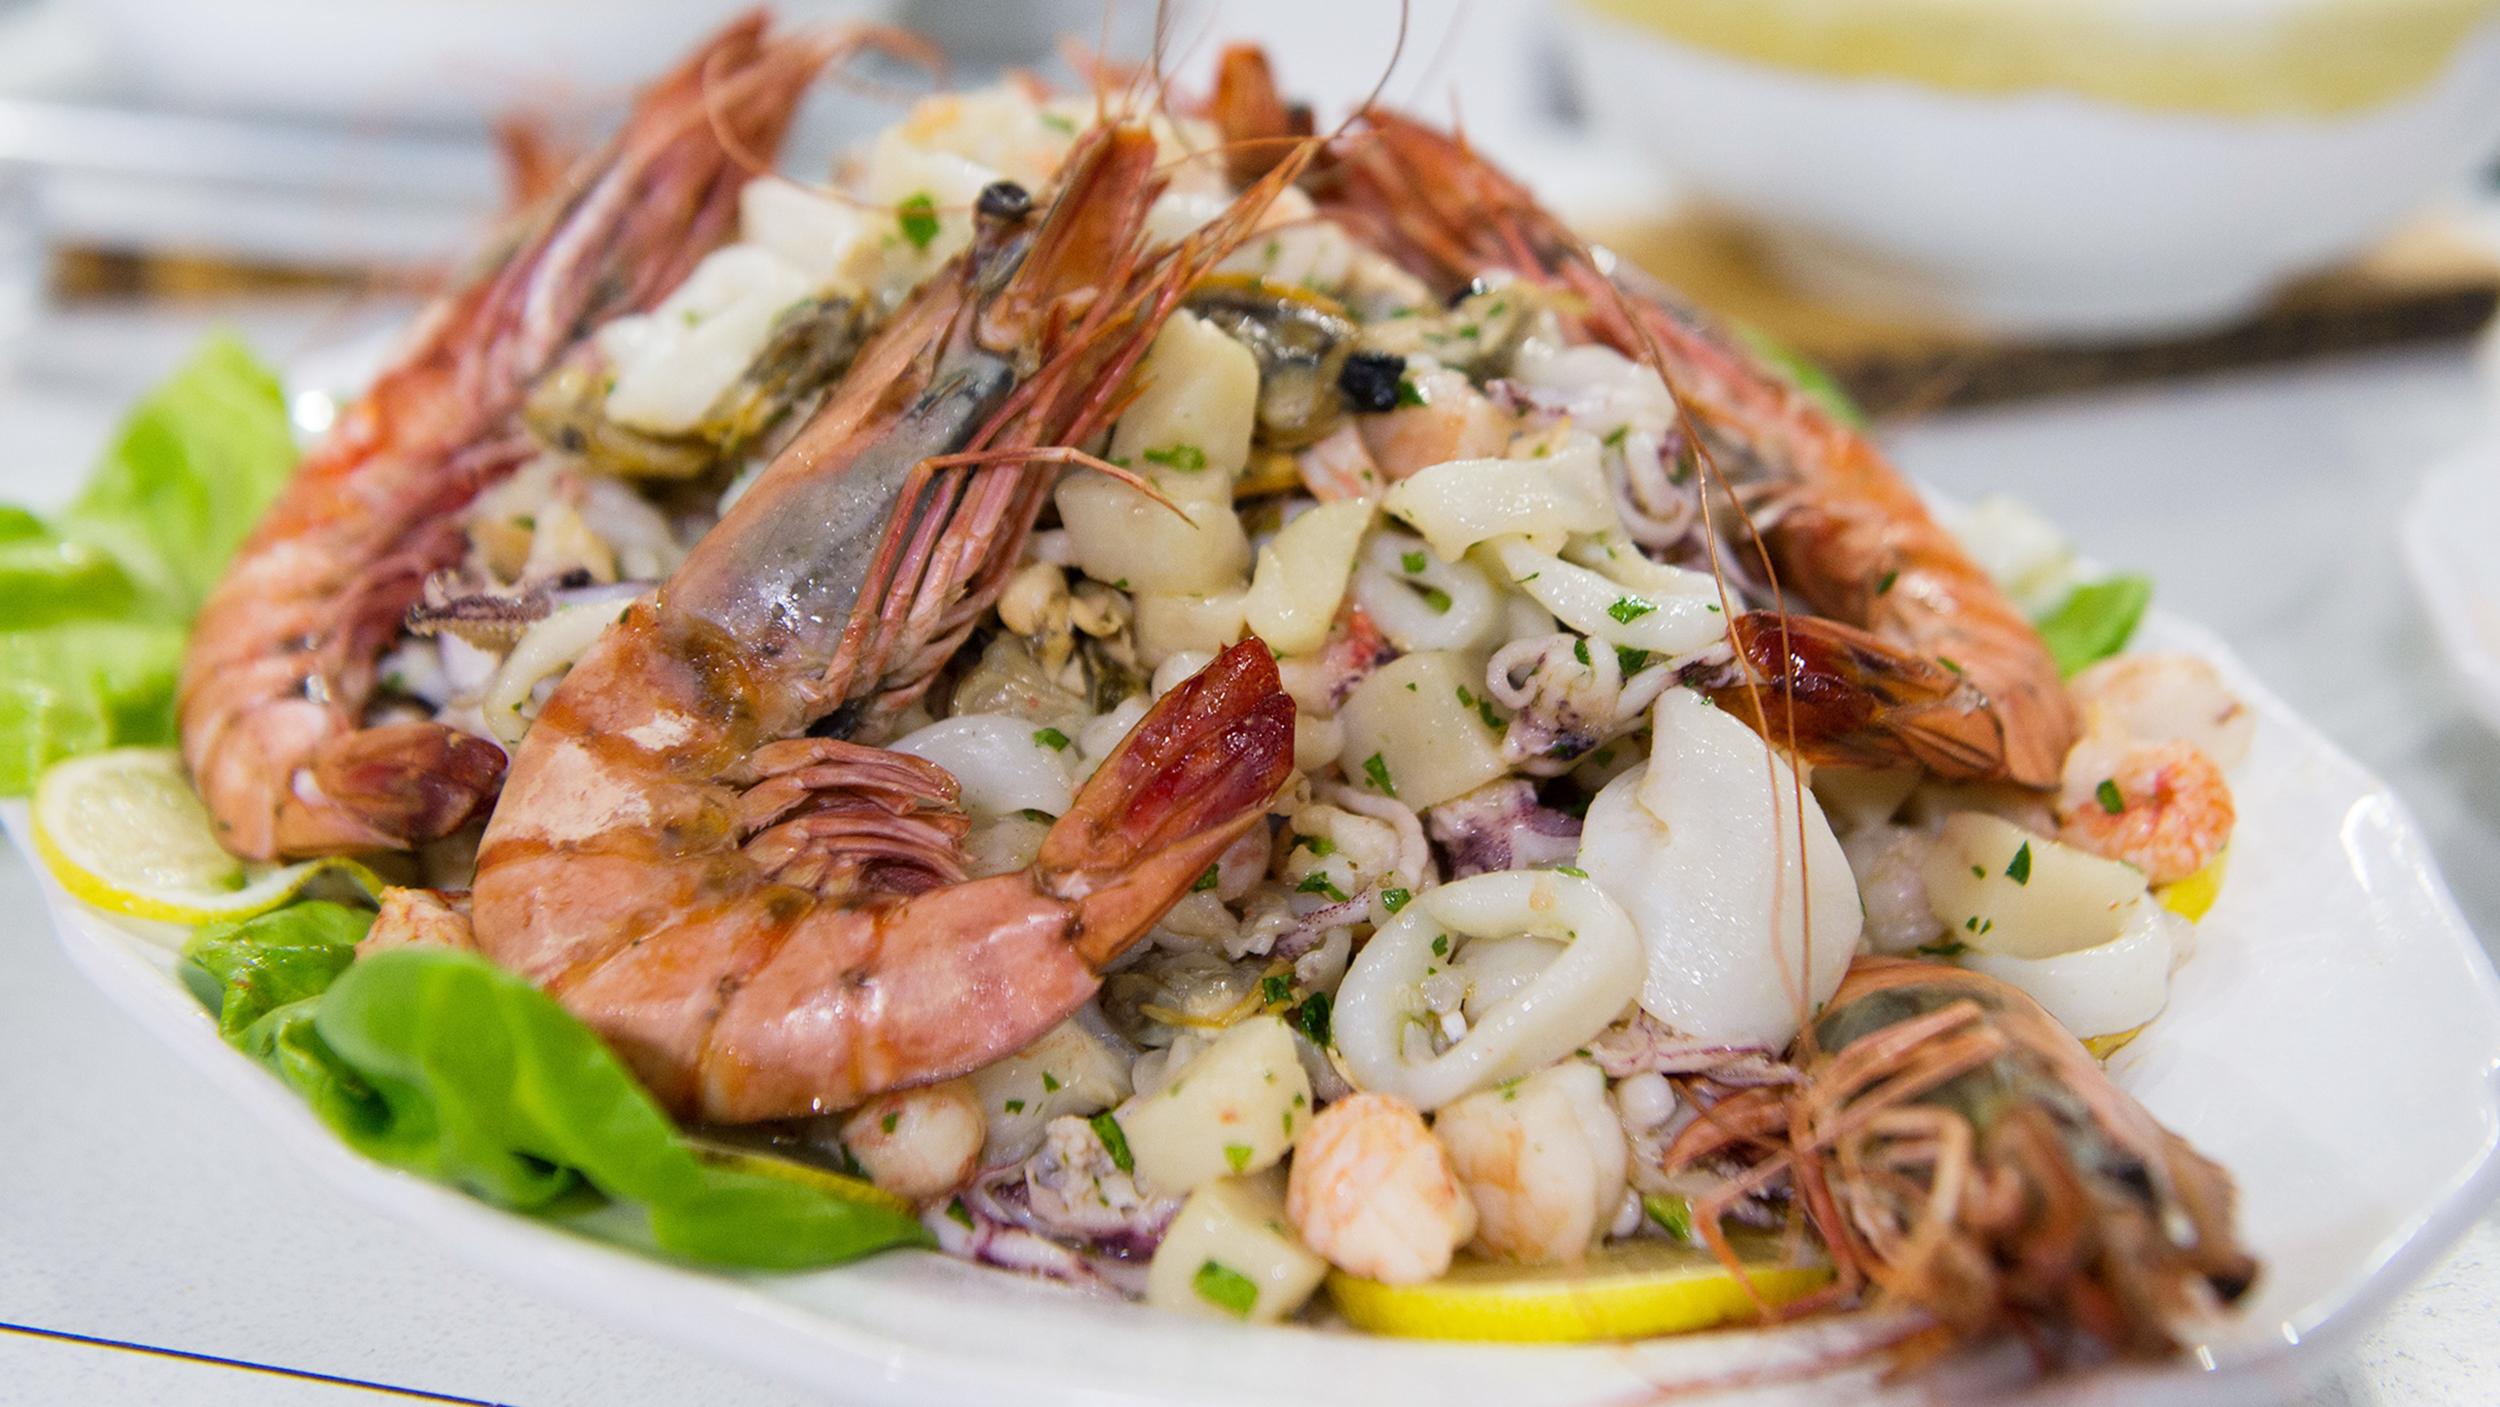 Italian seafood salad insalata di mare for What are the seven fishes